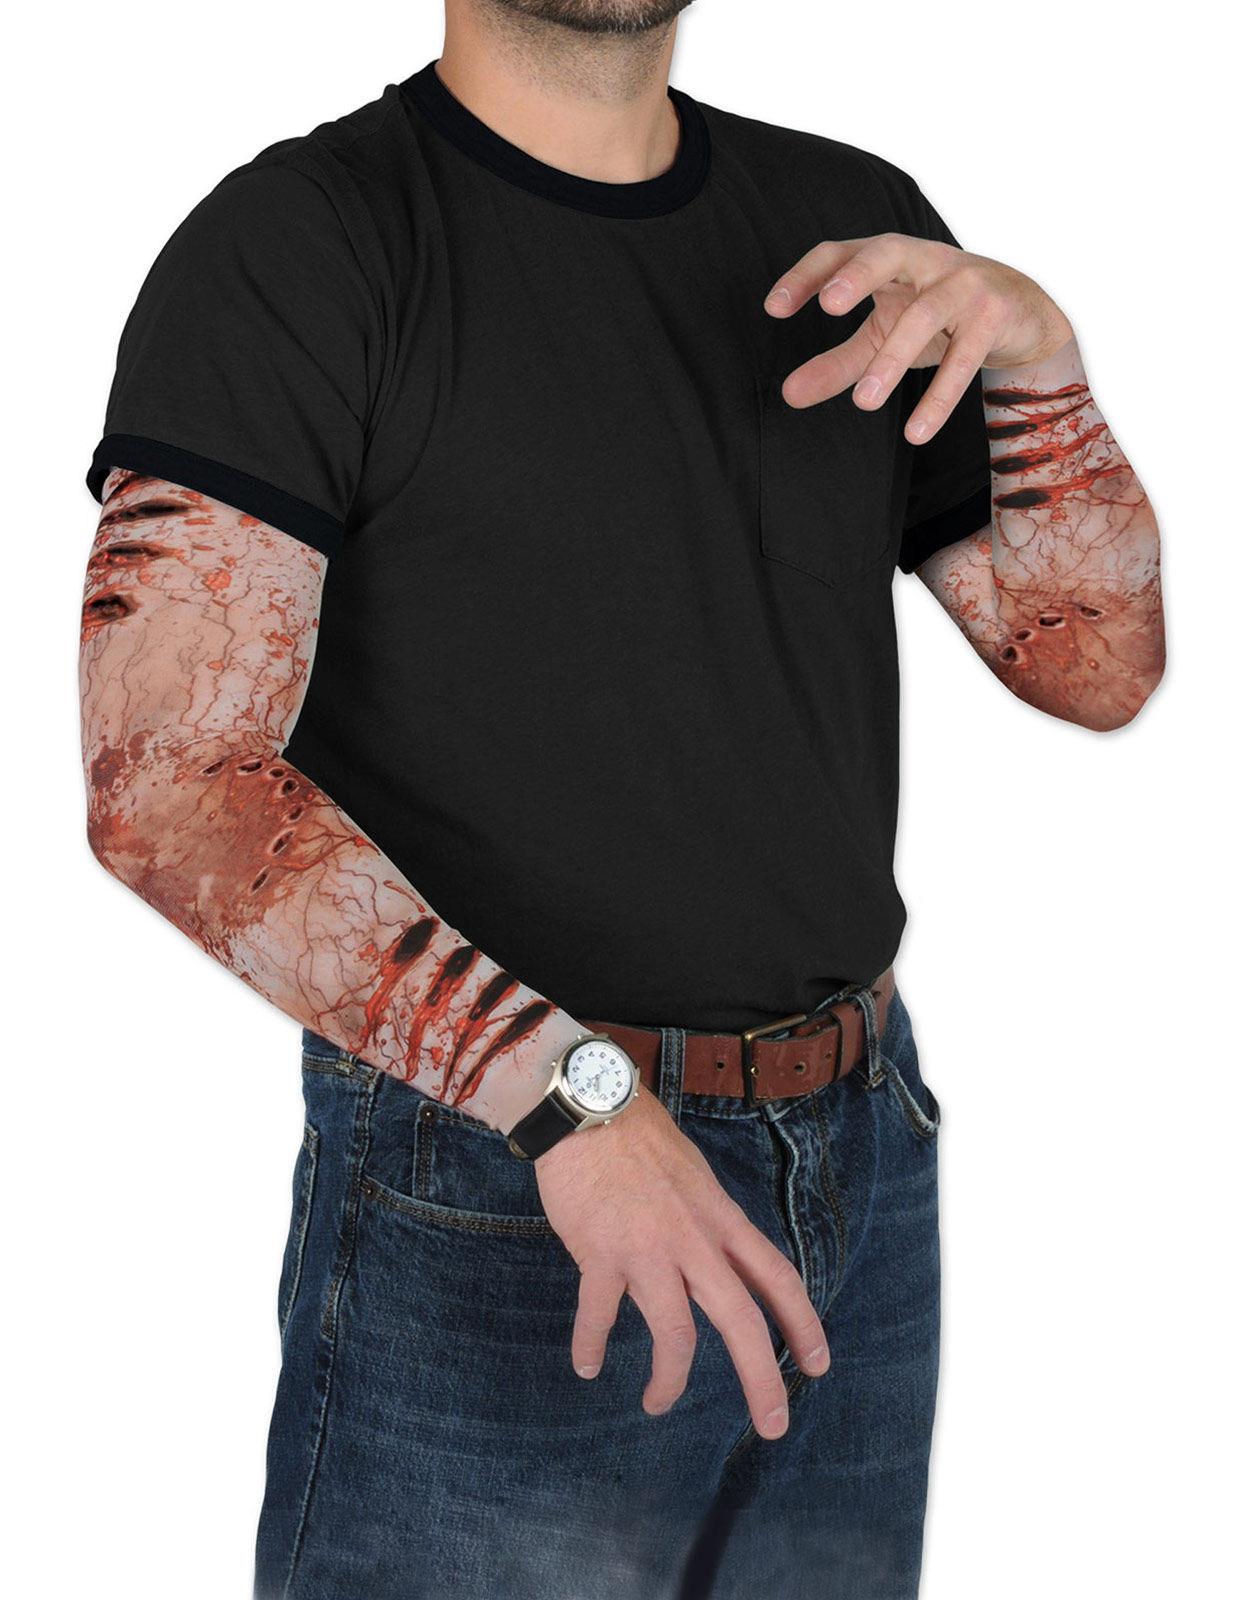 tattoo rmel zombie biss halloween bunt g nstige faschings accessoires zubeh r bei karneval. Black Bedroom Furniture Sets. Home Design Ideas